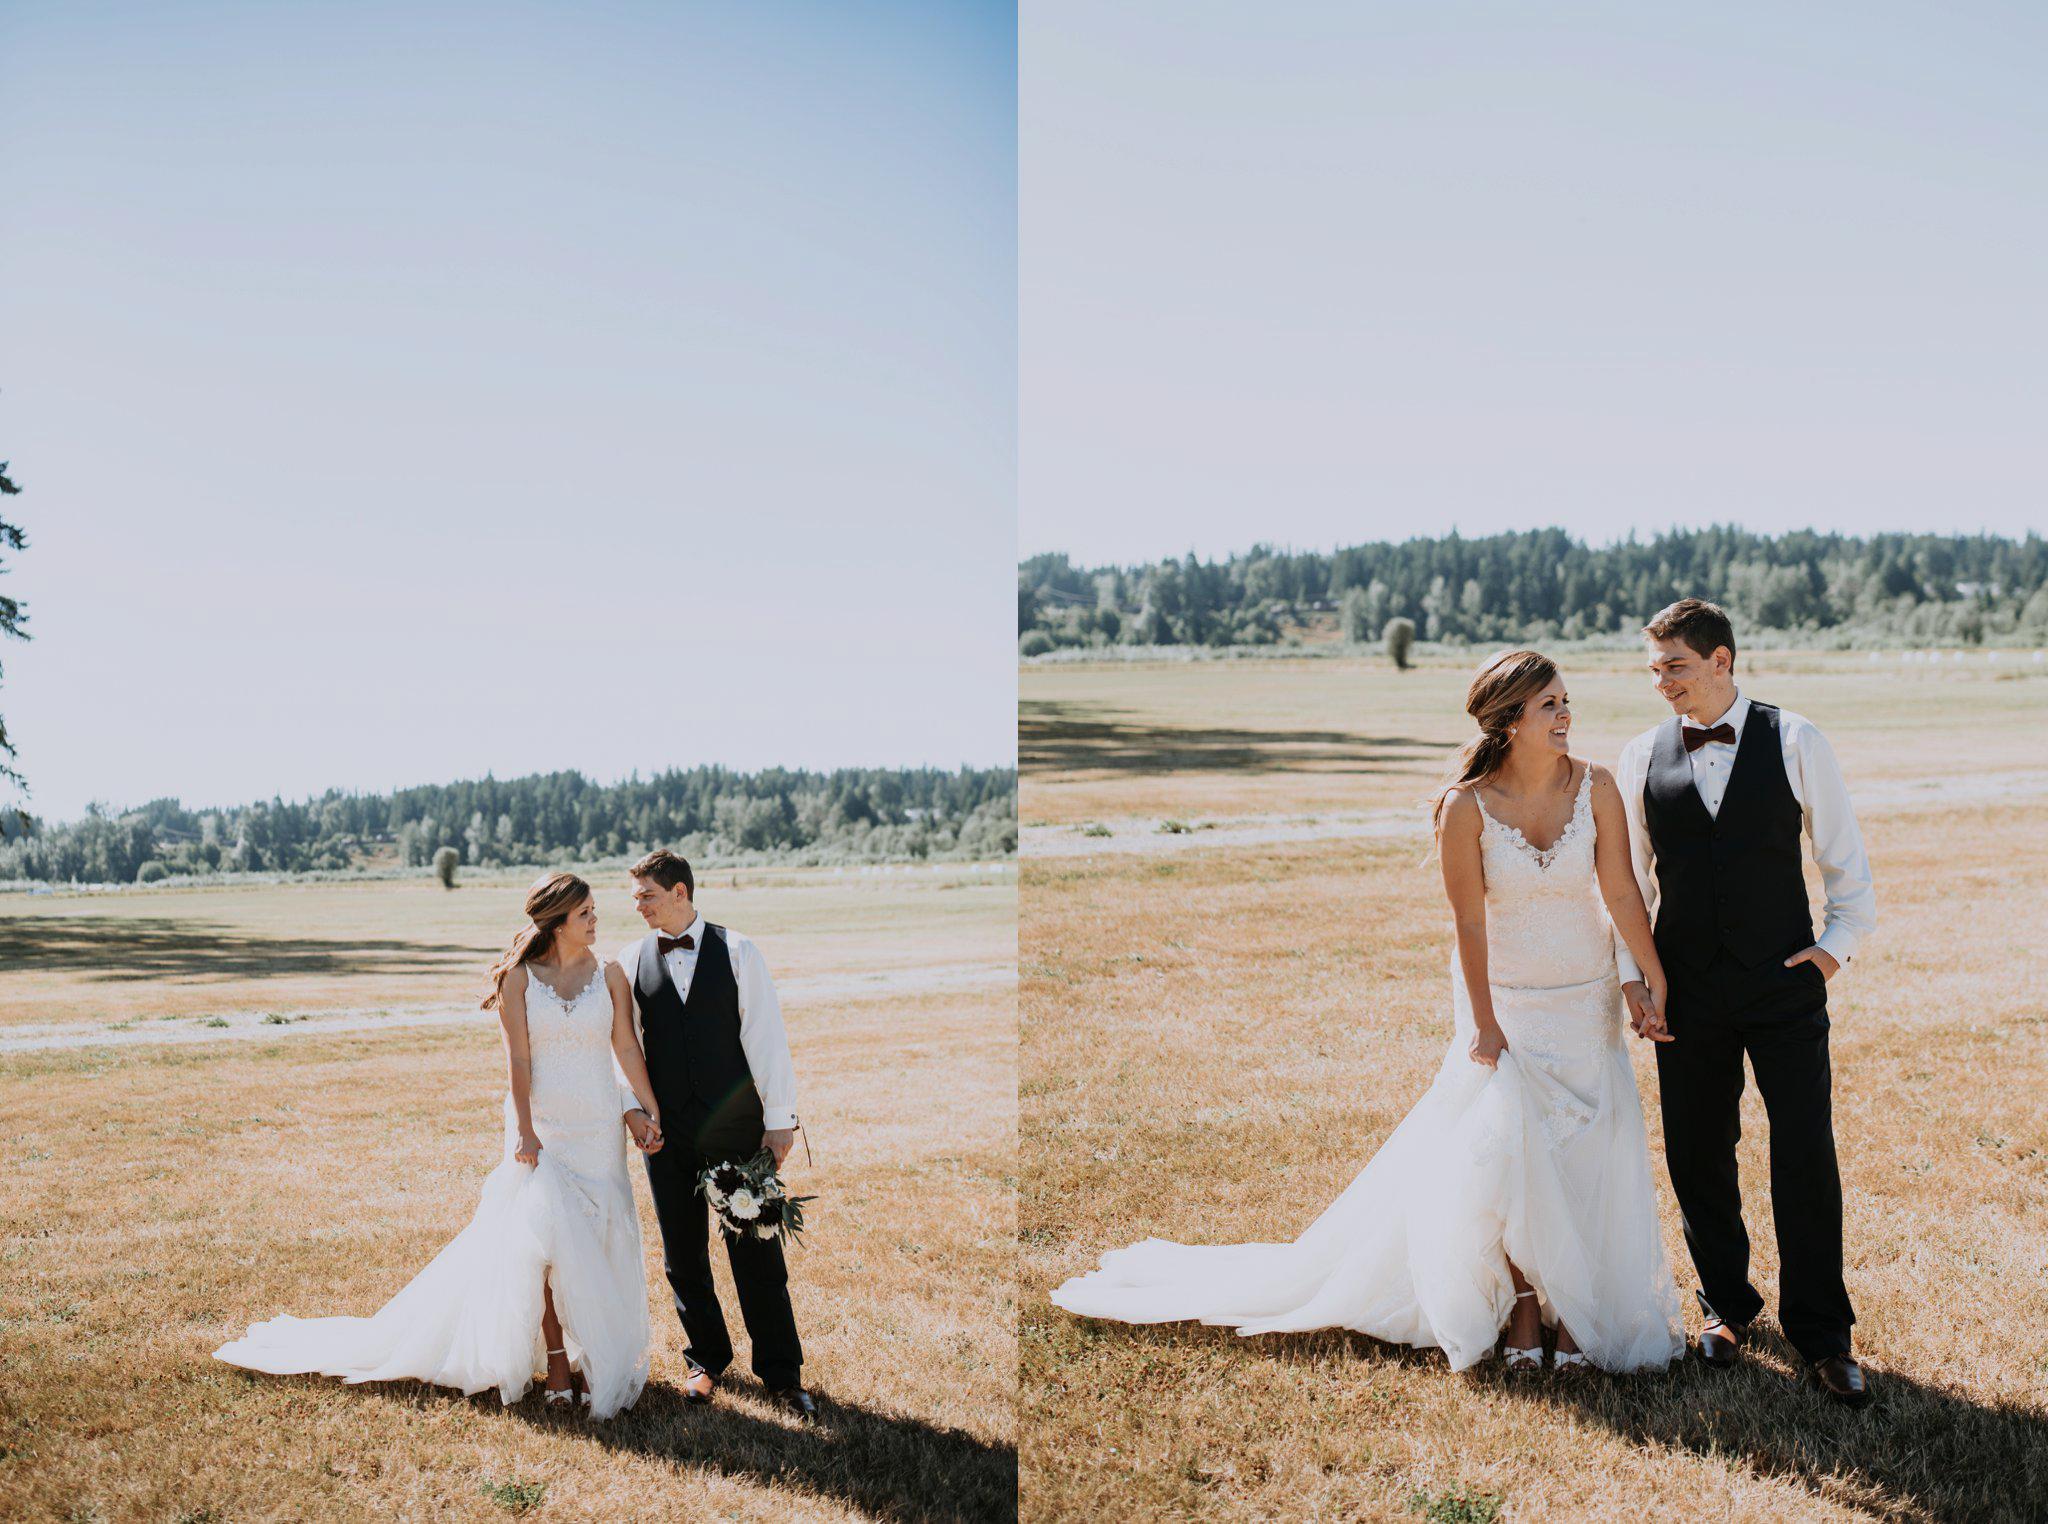 kristen-and-cody-the-kelley-farm-wedding-seattle-photographer-caitlyn-nikula-55.jpg